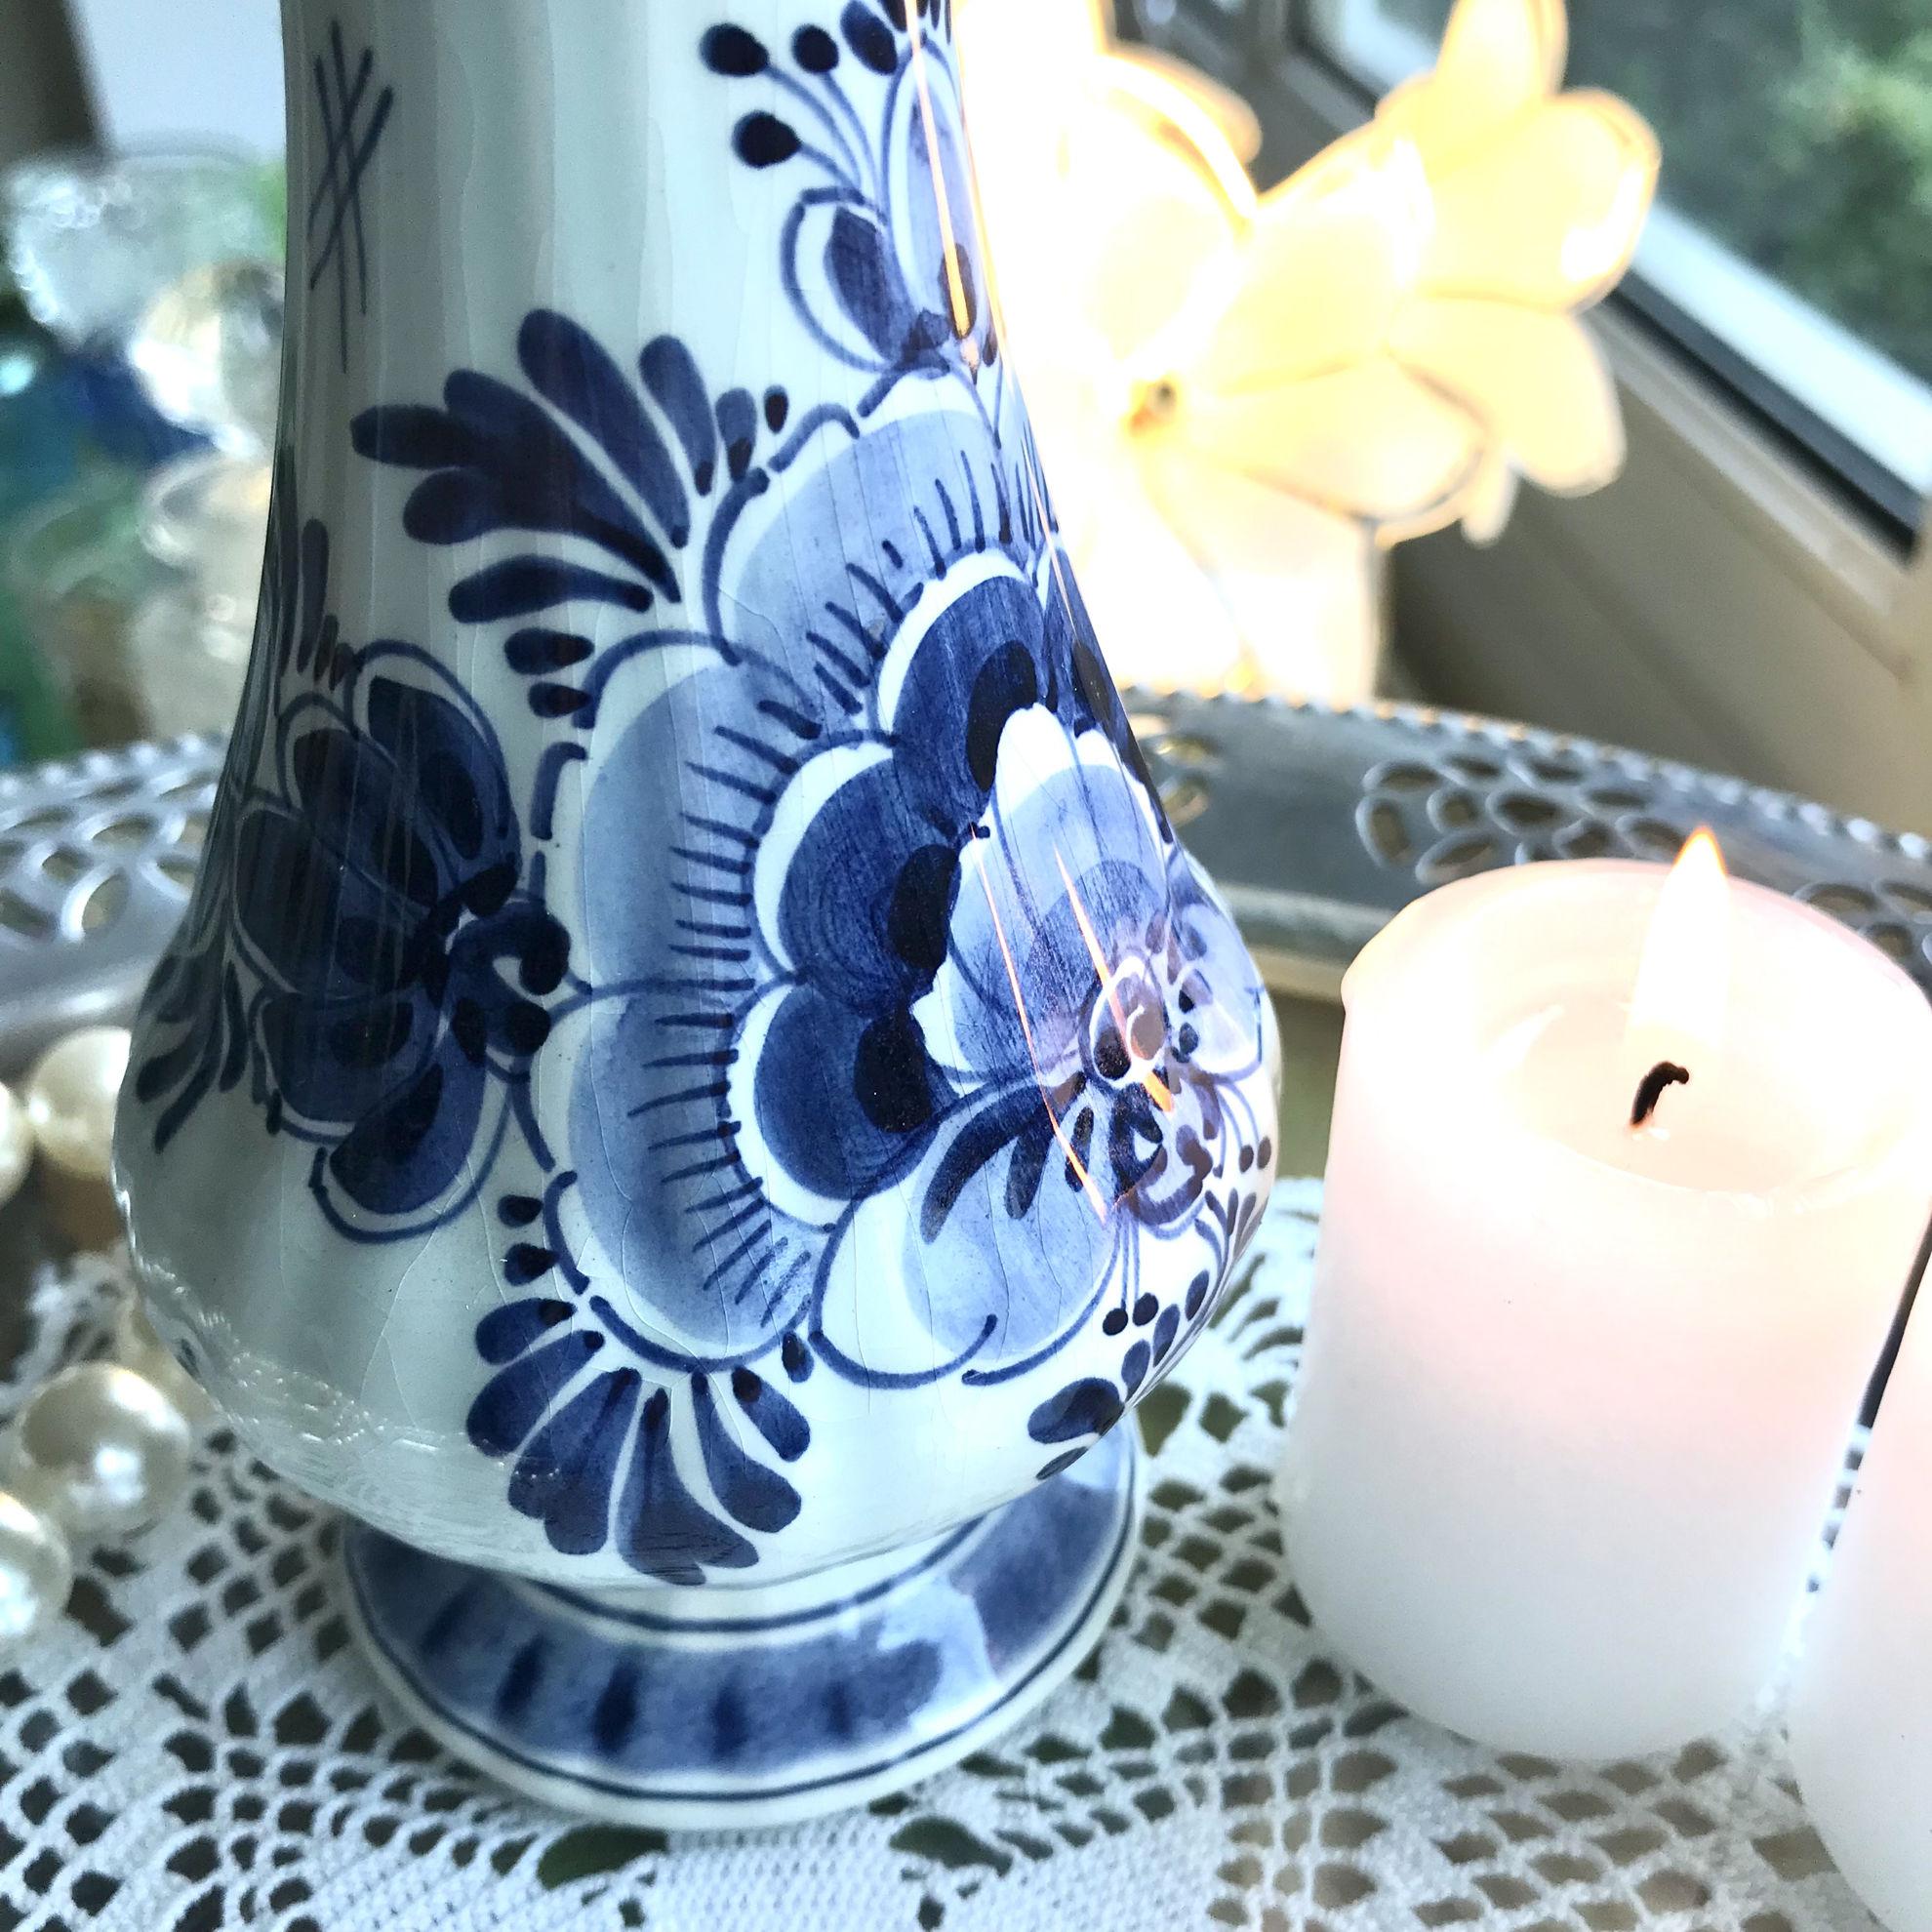 Delft blue vazo resmi